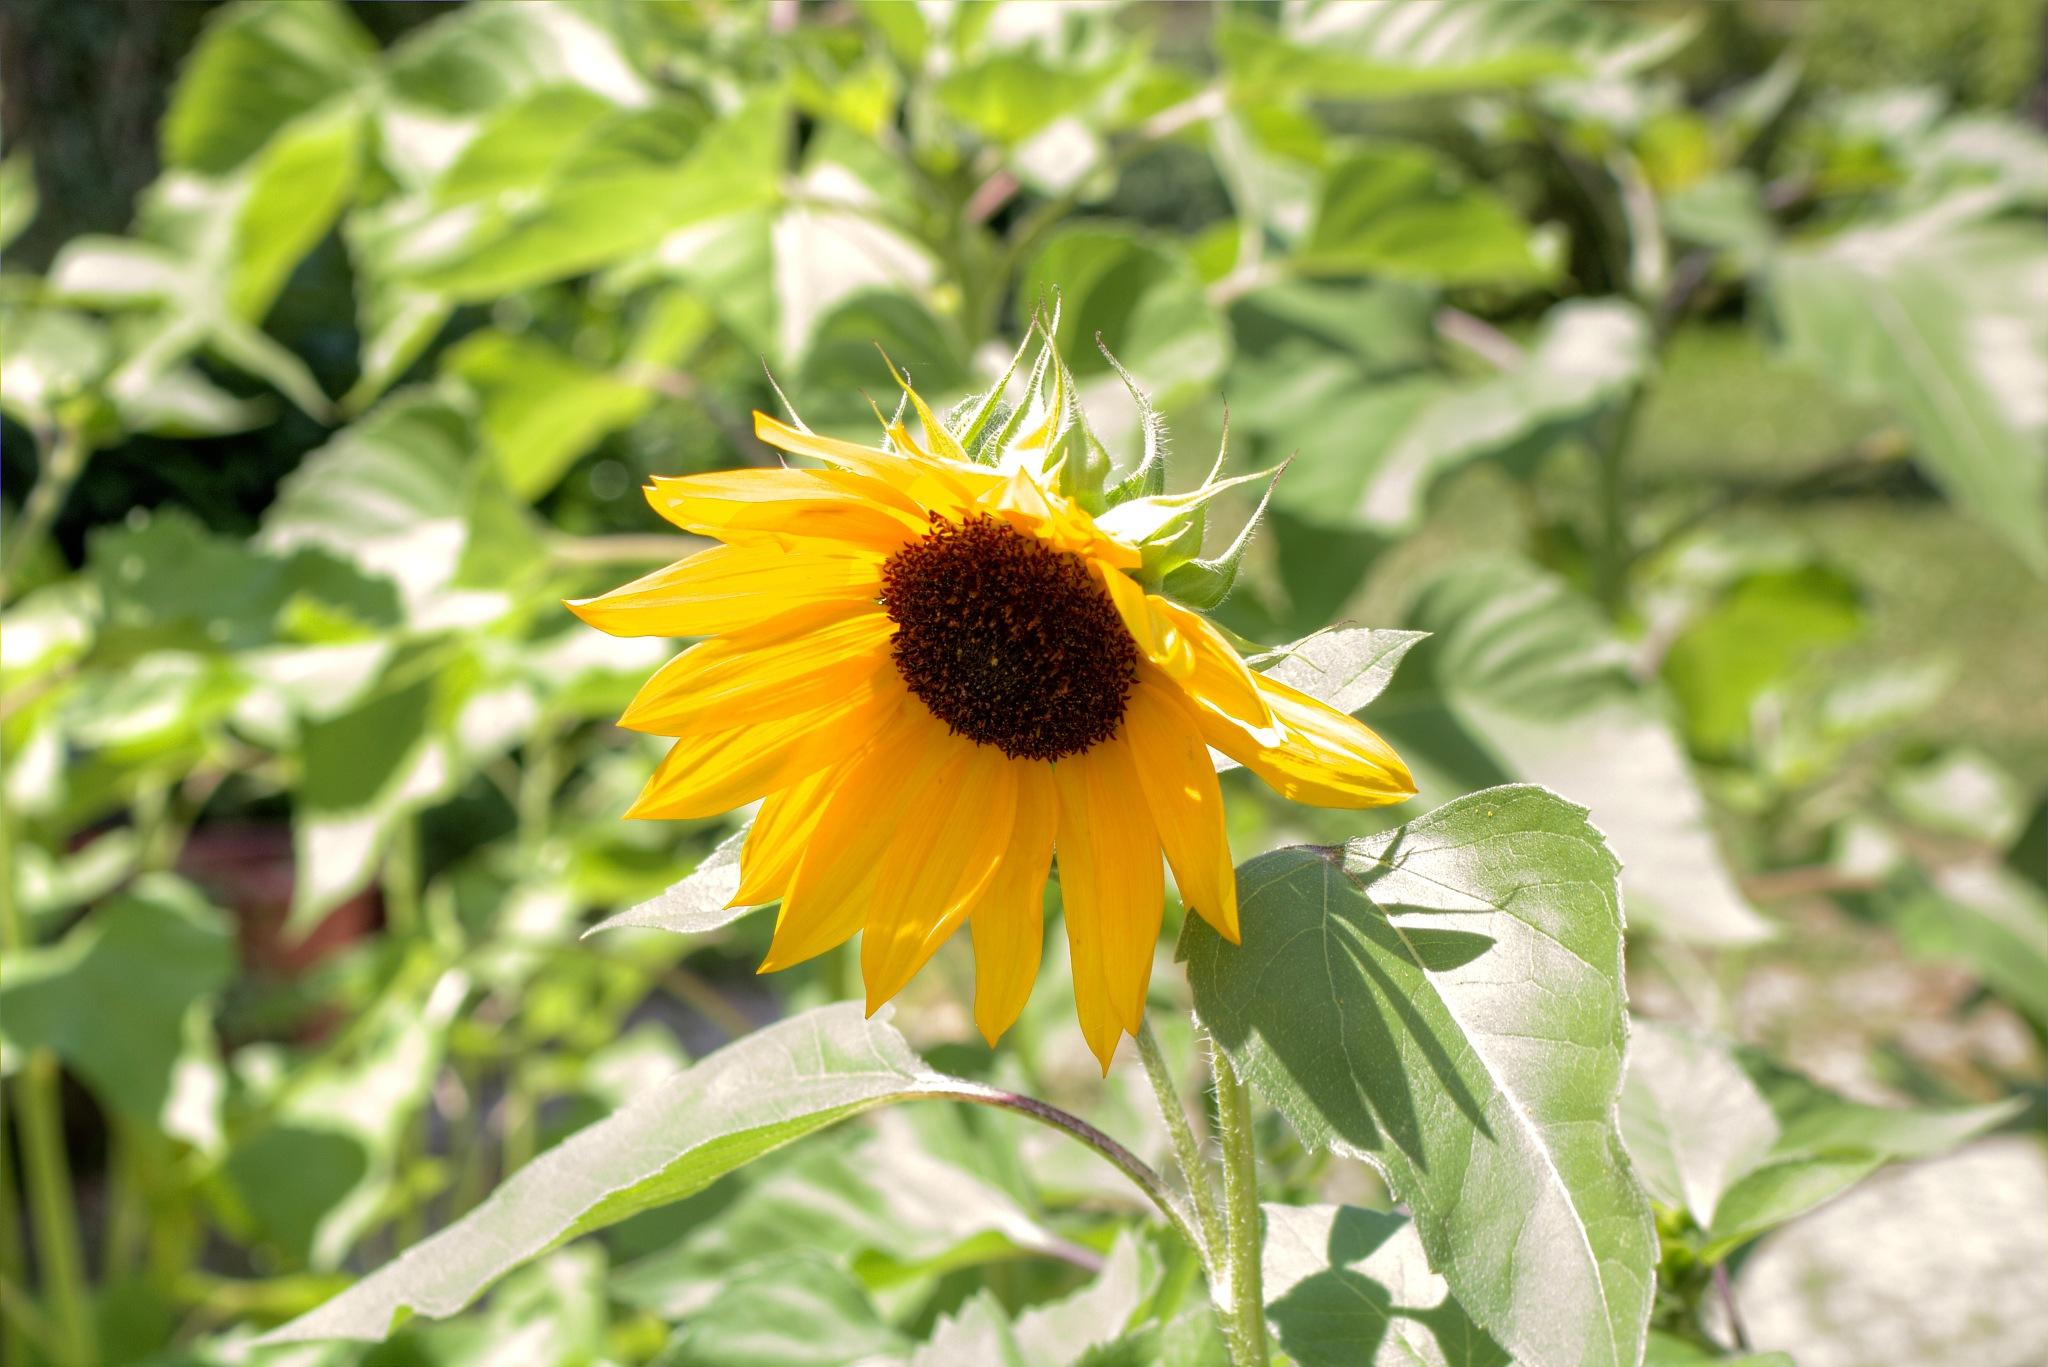 Sunflower  by zvnktomasevic